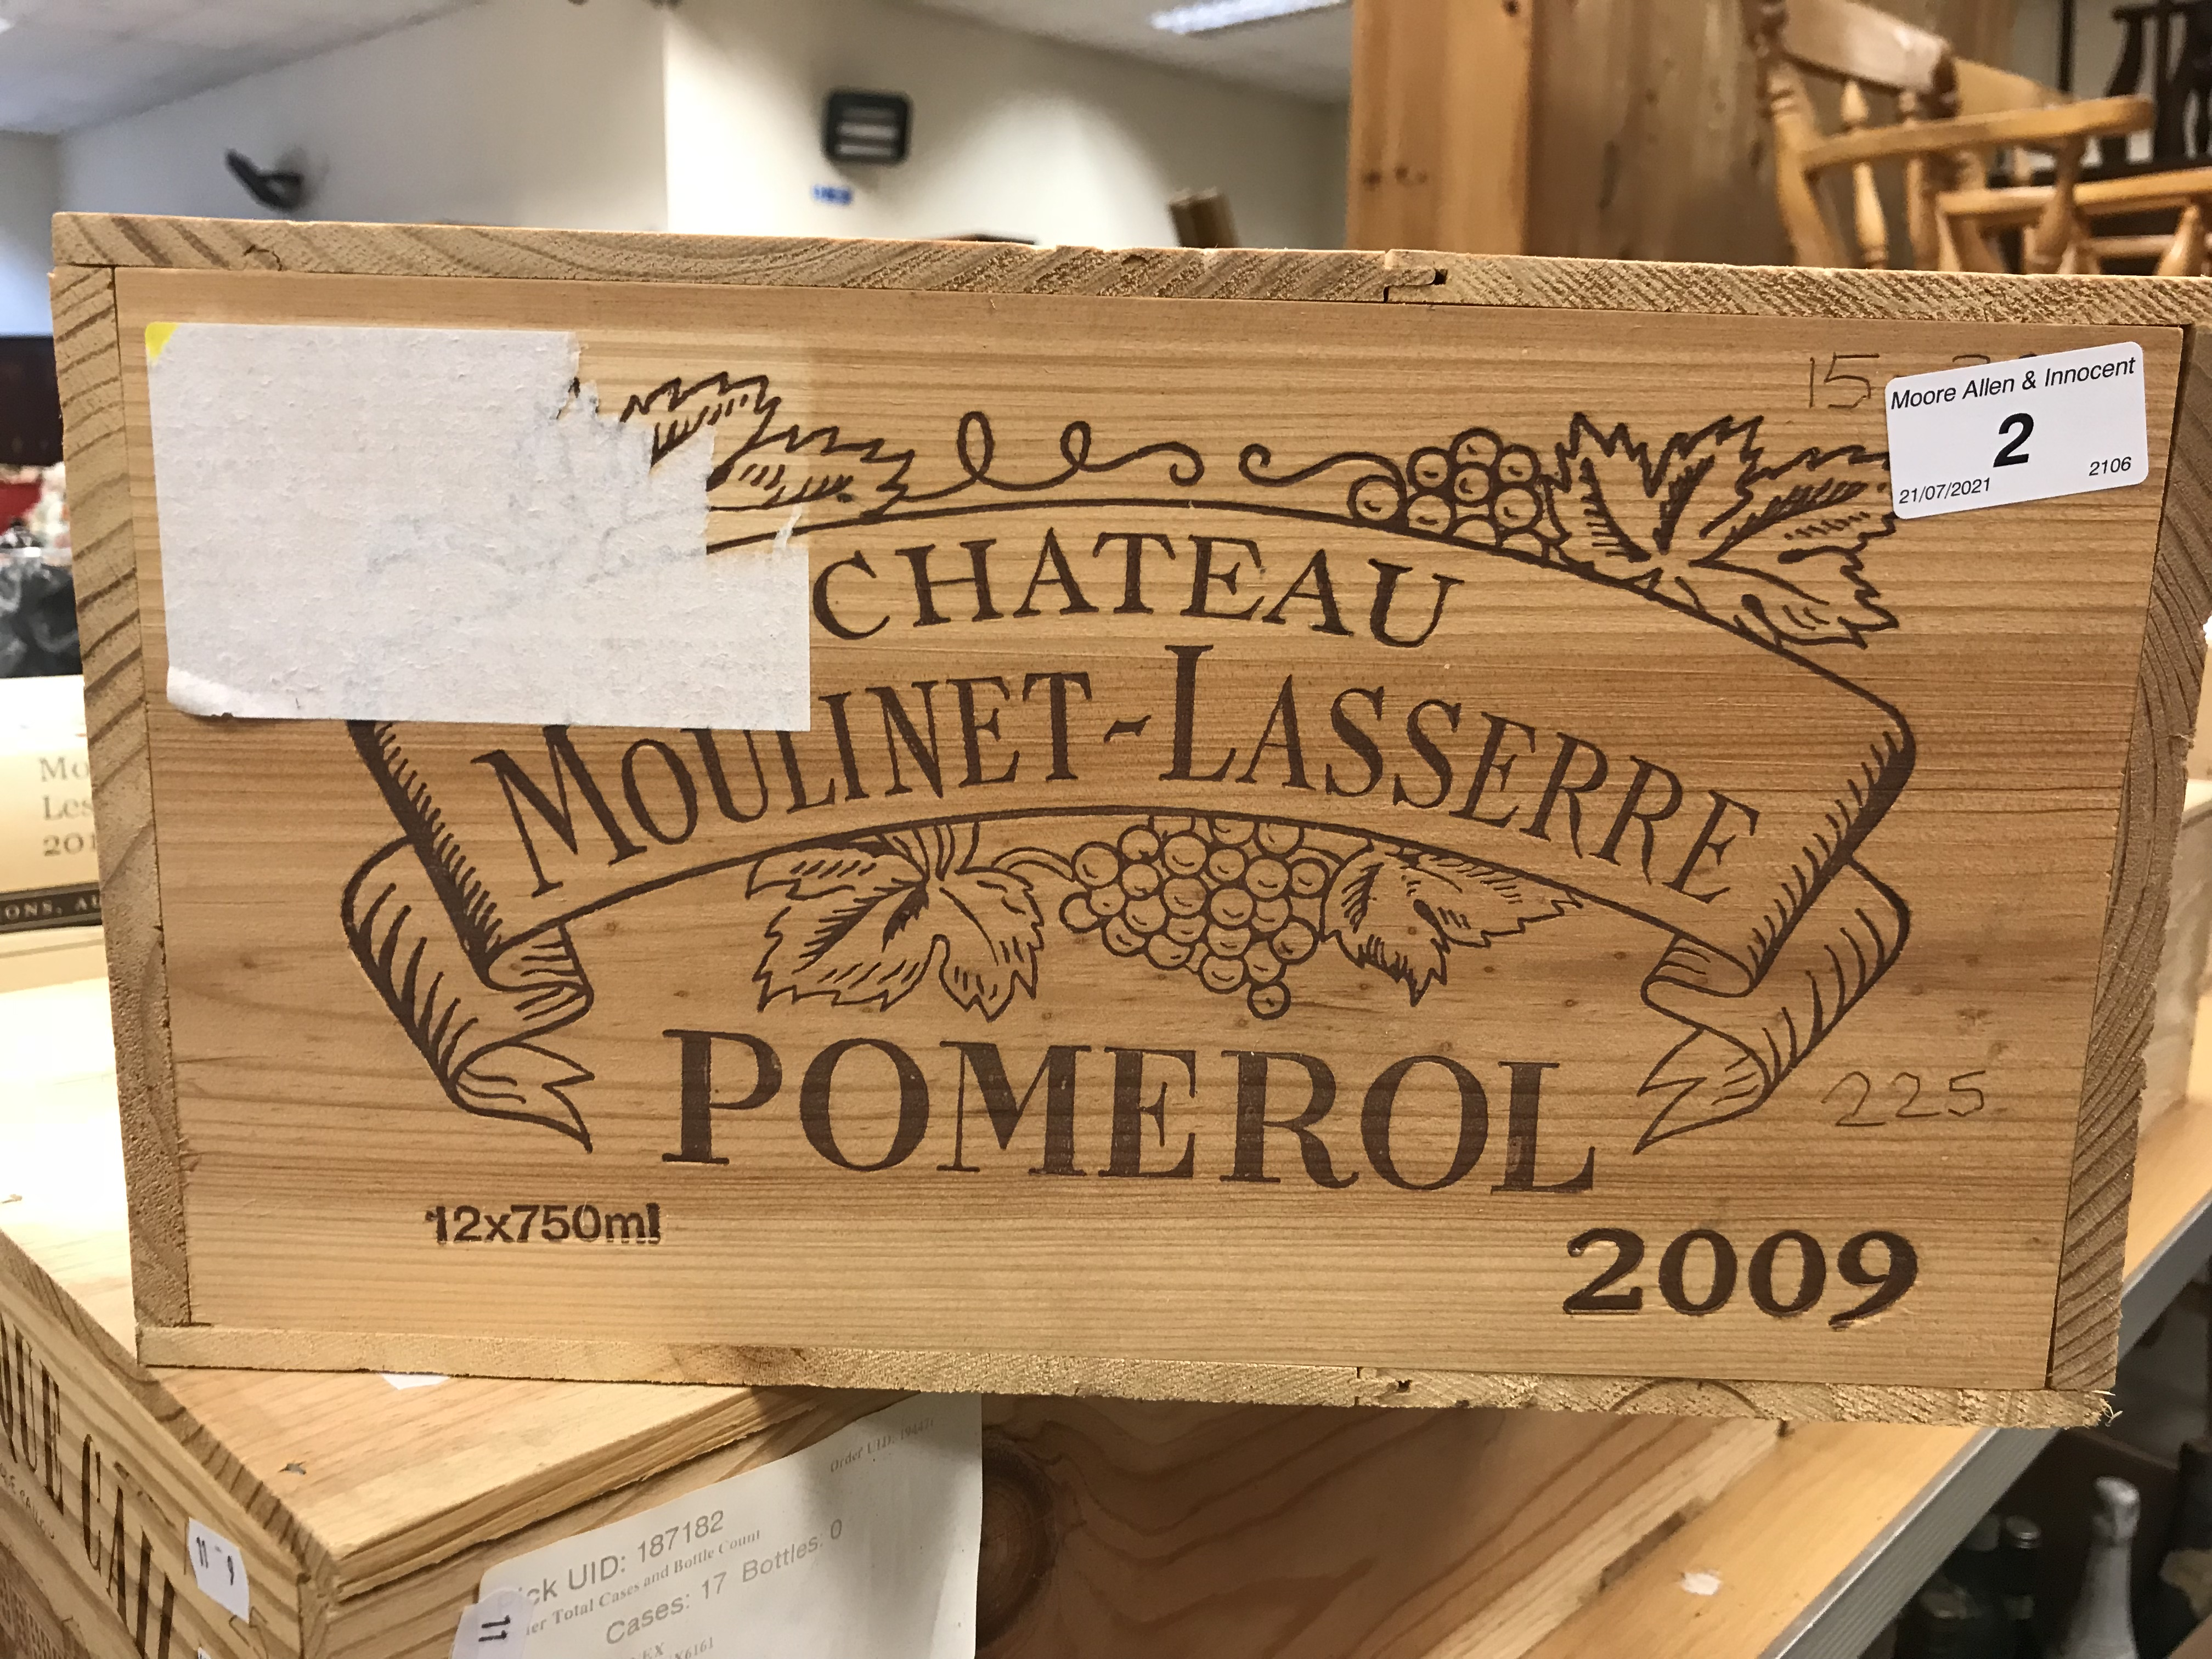 Chateau Moulinet-Lasserre Pomerol 2009 x 12 bottles (OWC)